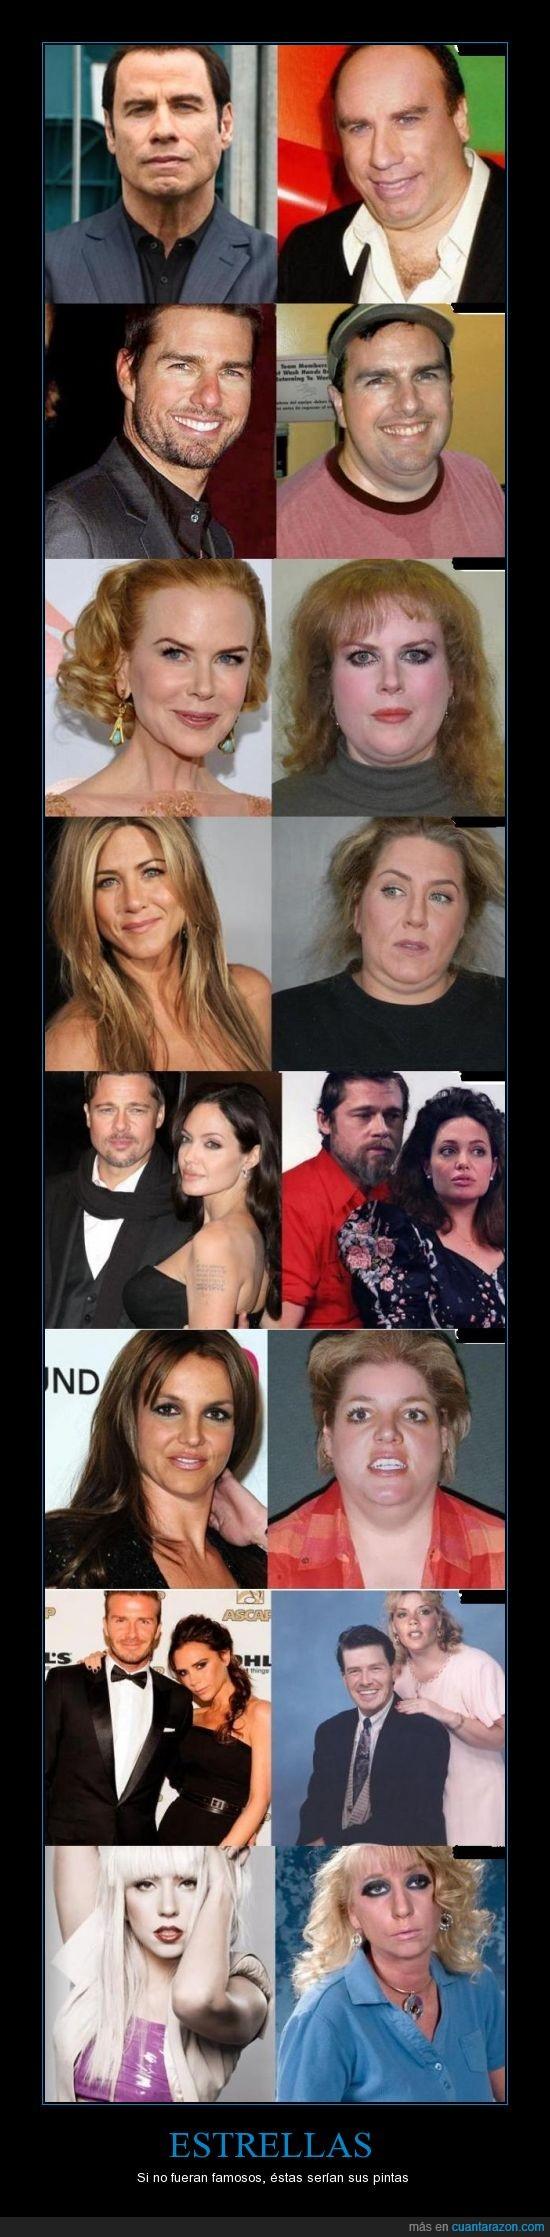 Brangelina,Britney Spears,David y Victoria Beckham,Jennifer Aniston,John Travolta.,Lady Gaga,Nicole Kidman,tom cruise